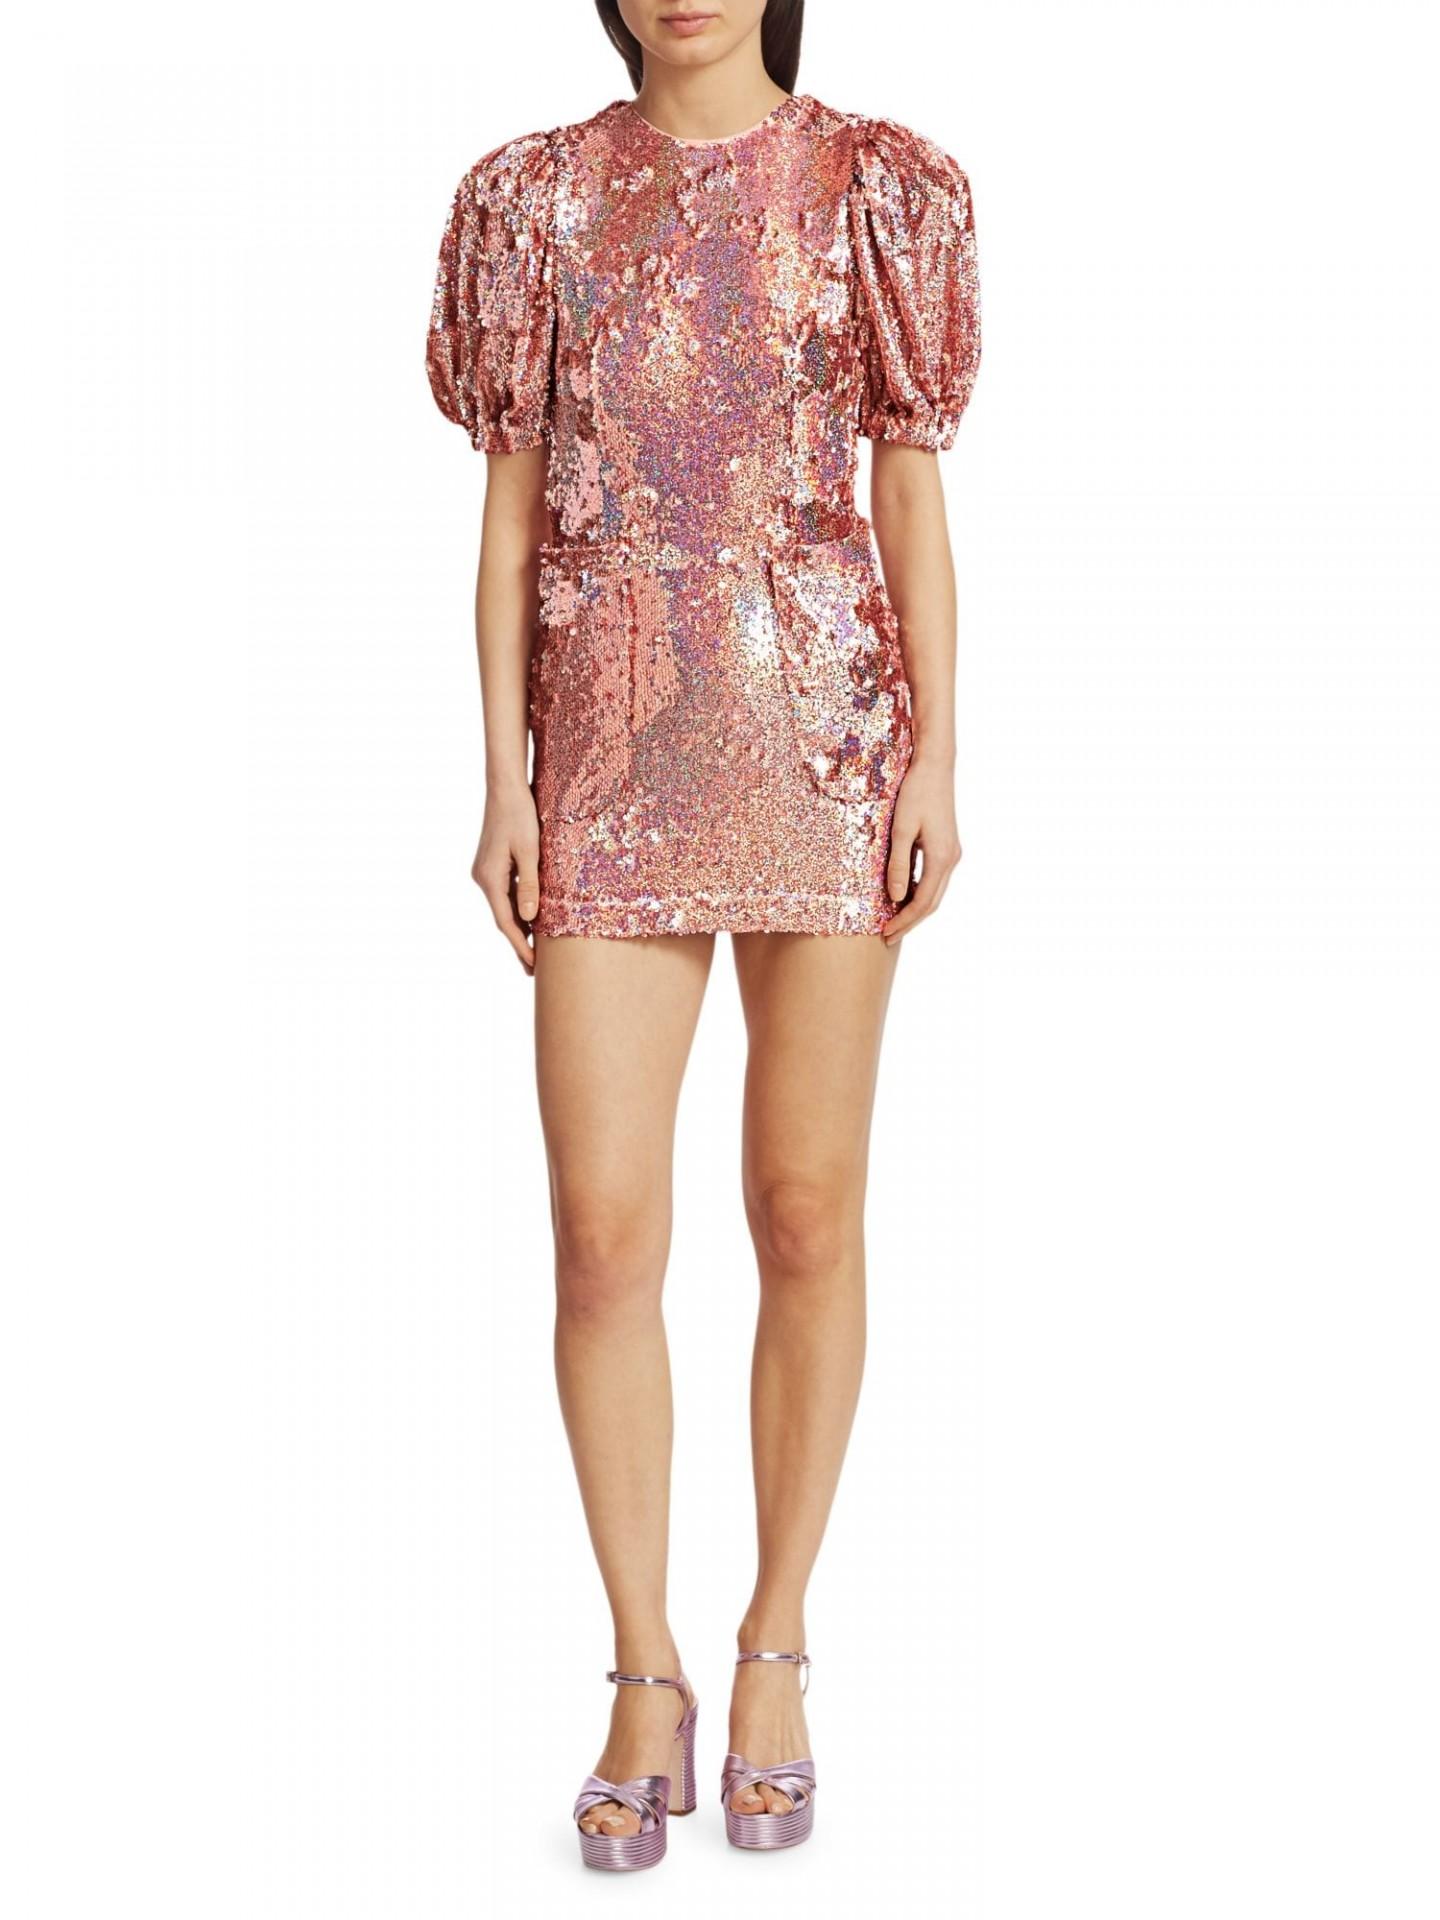 ROTATE BIRGER CHRISTENSEN Katie Puff Sleeve Sequin Mini Dress